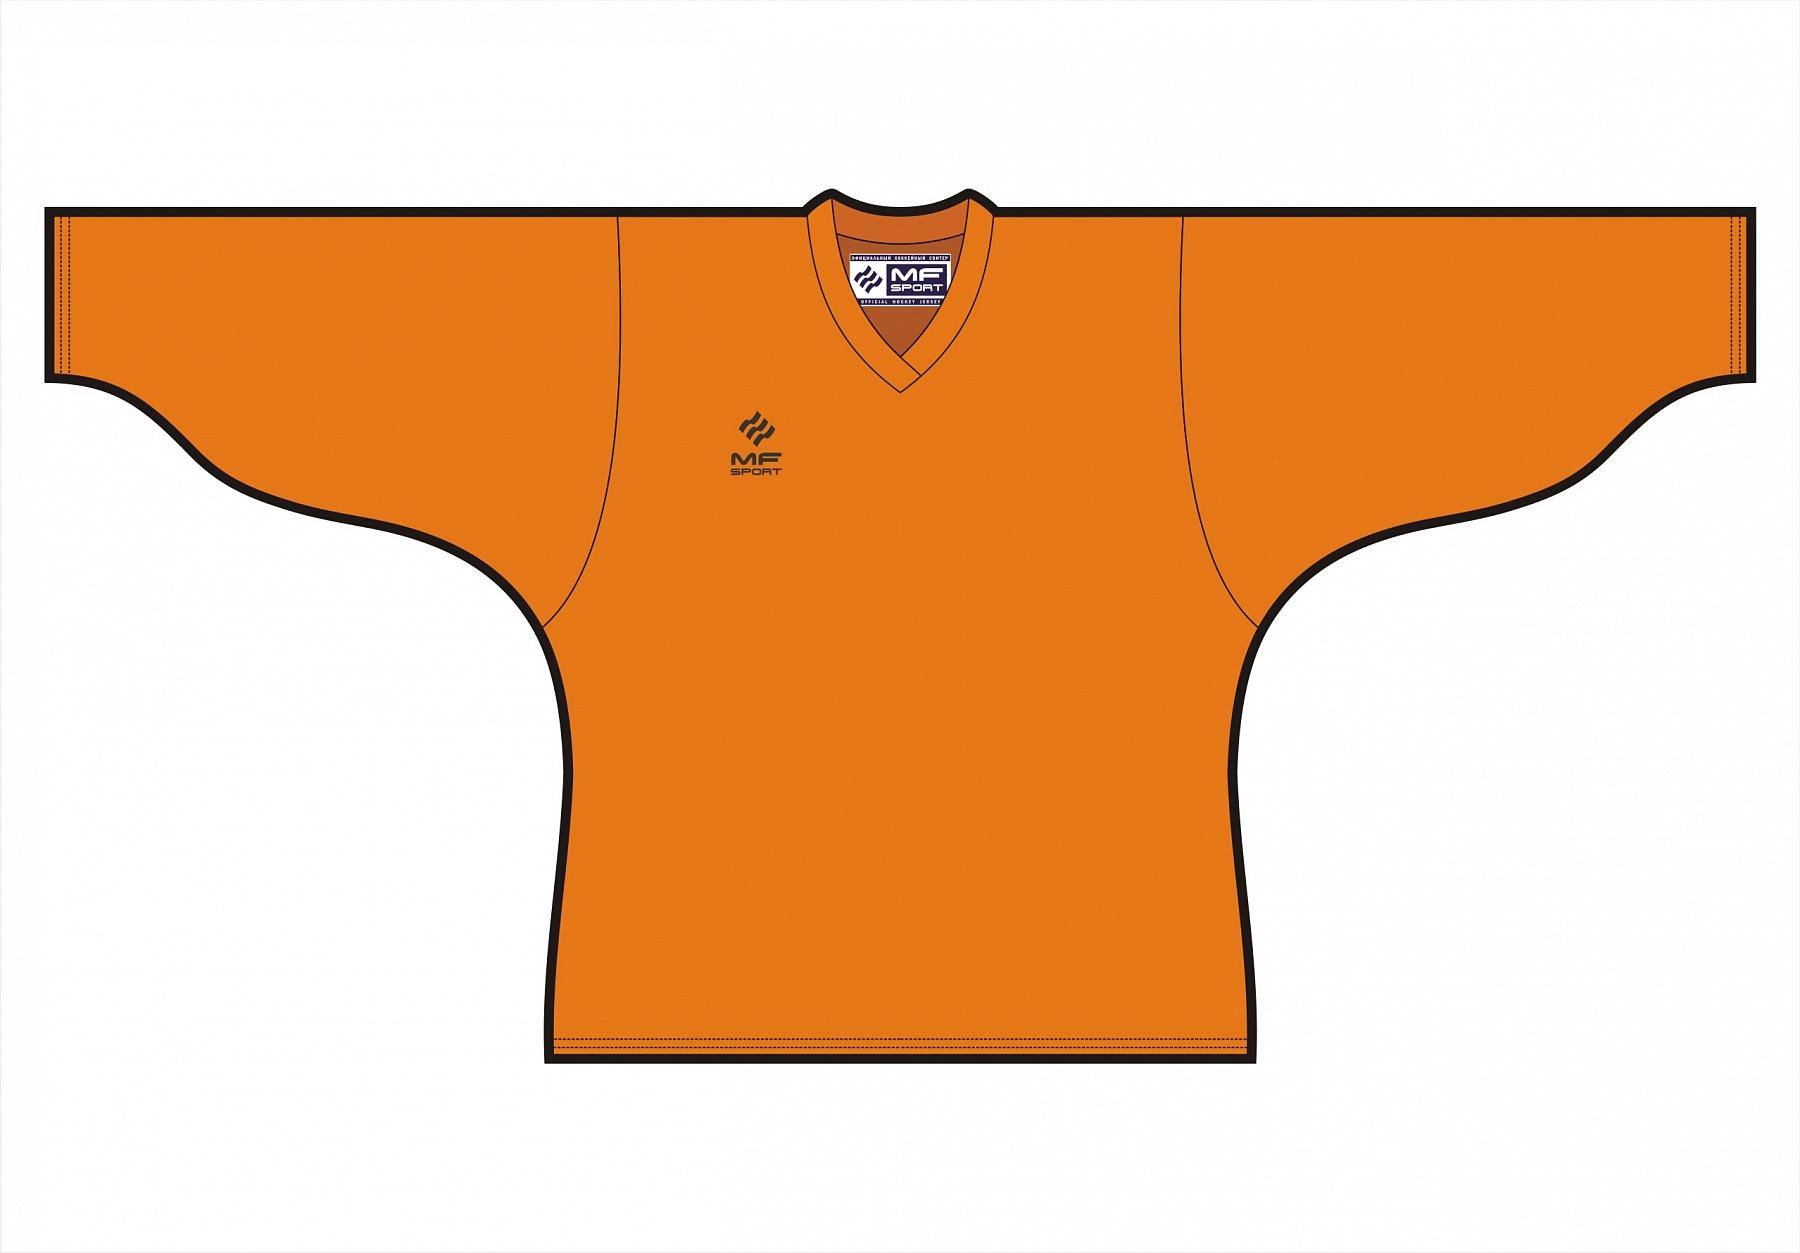 Нанесение логотипа на форму